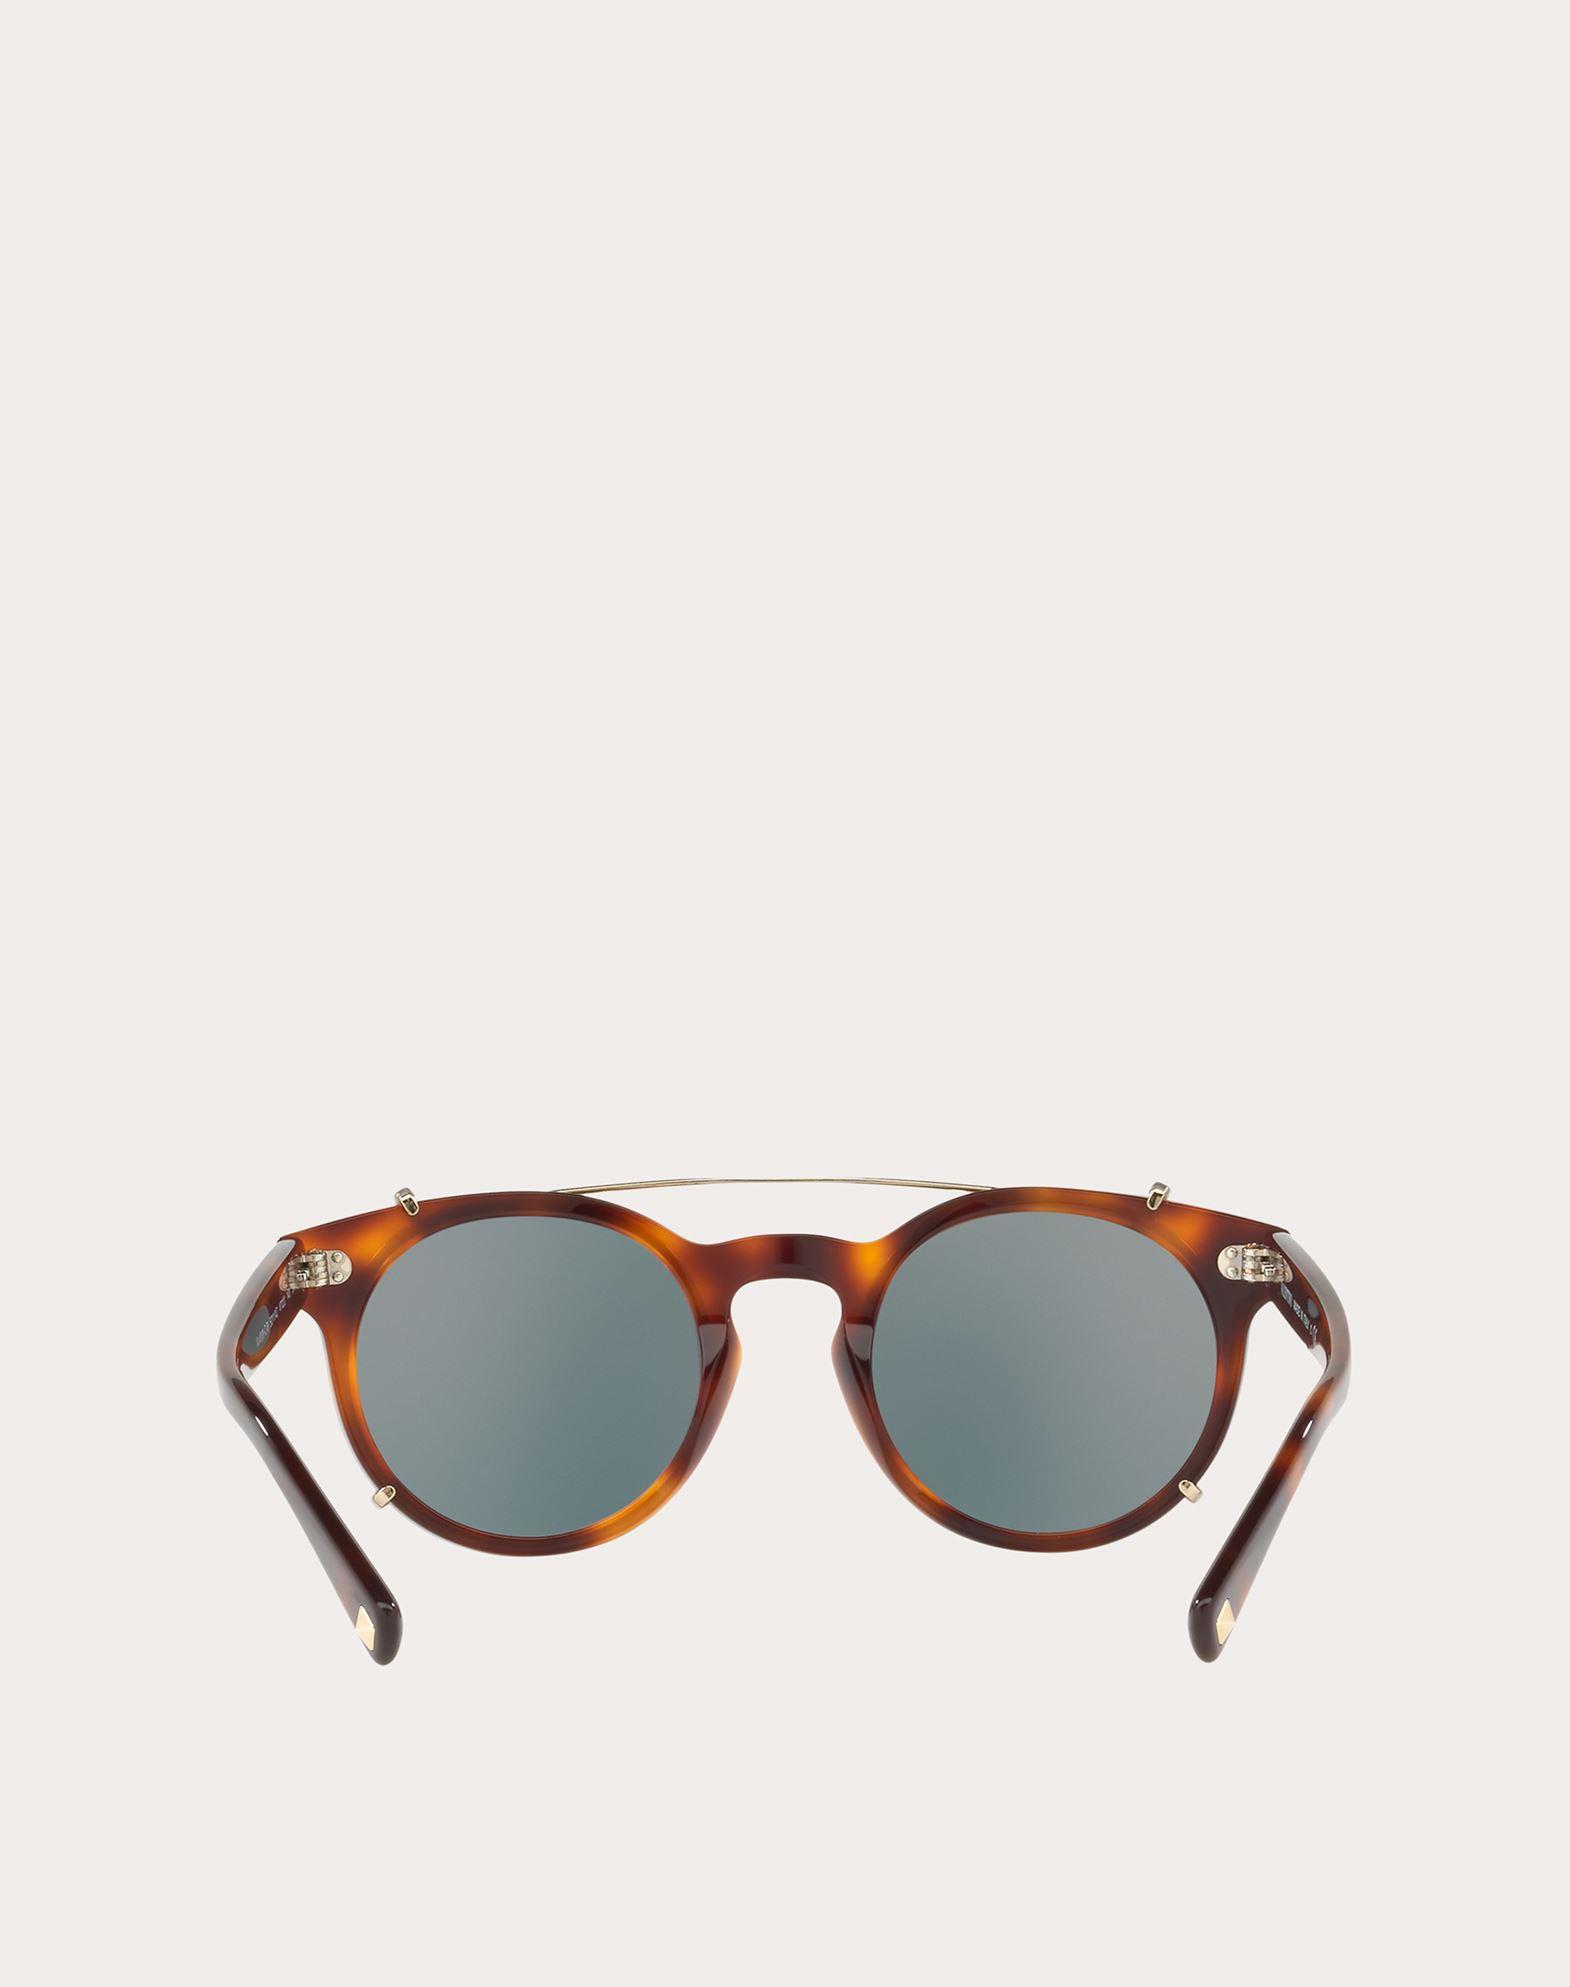 VALENTINO OCCHIALI Acetate Sunglasses Sunglasses U e